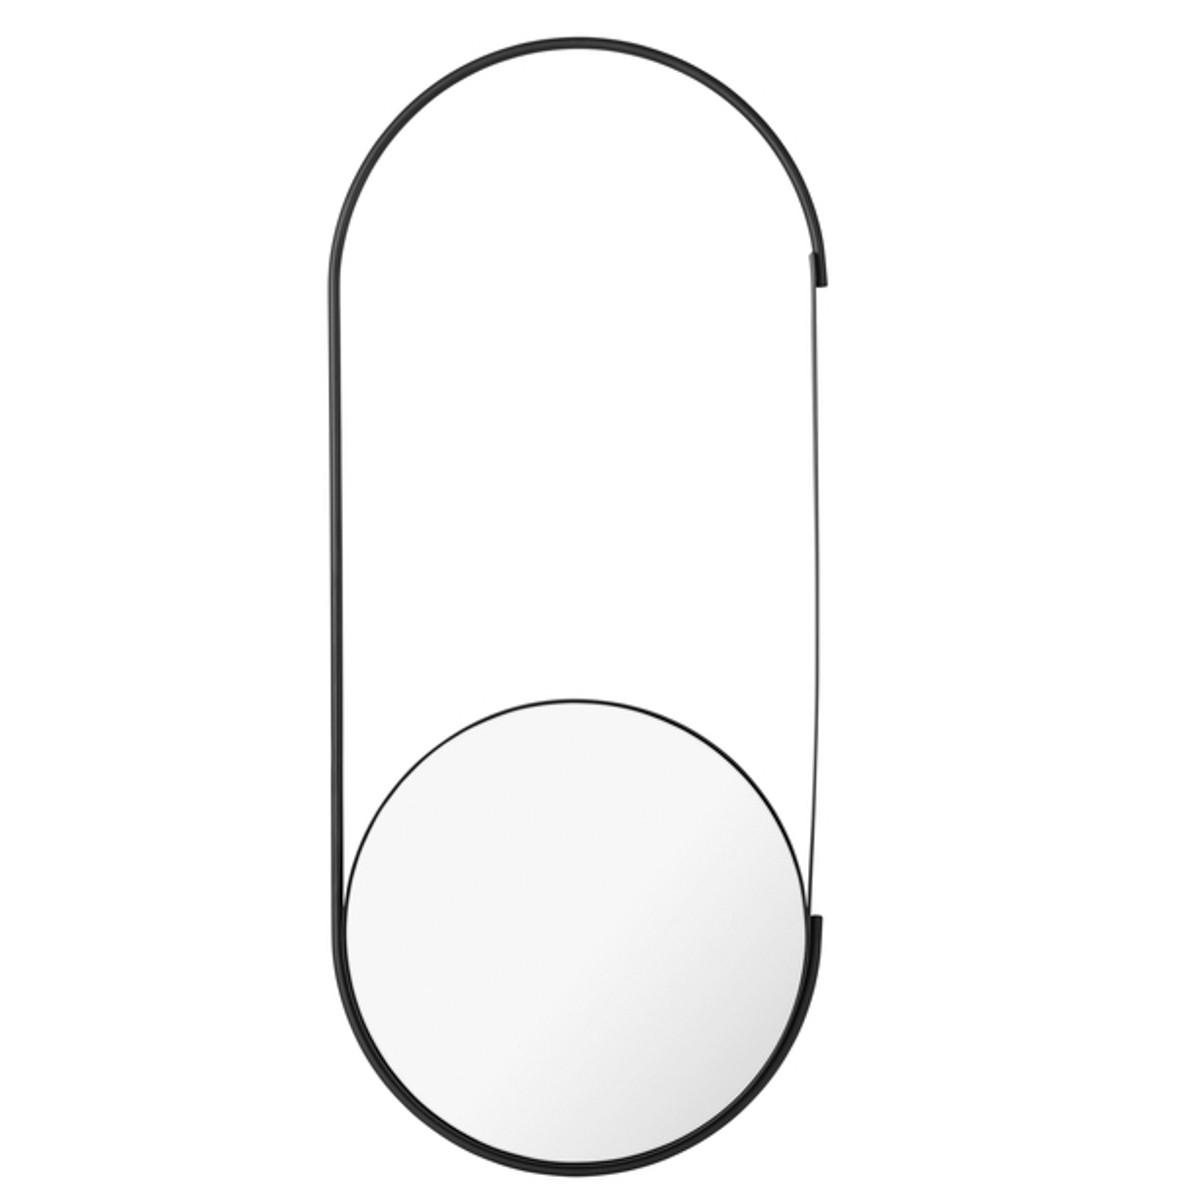 Kristina Dam Mobile Mirror